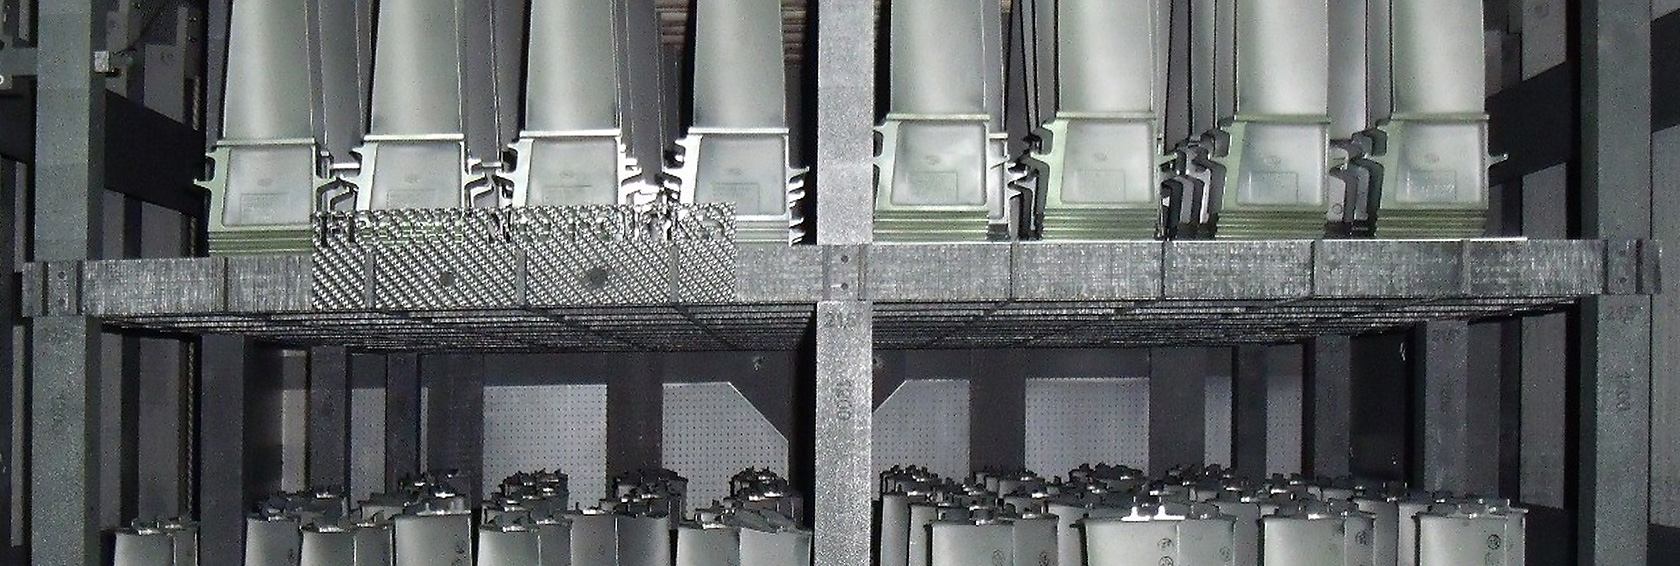 VFE vacuum furnace fixtures